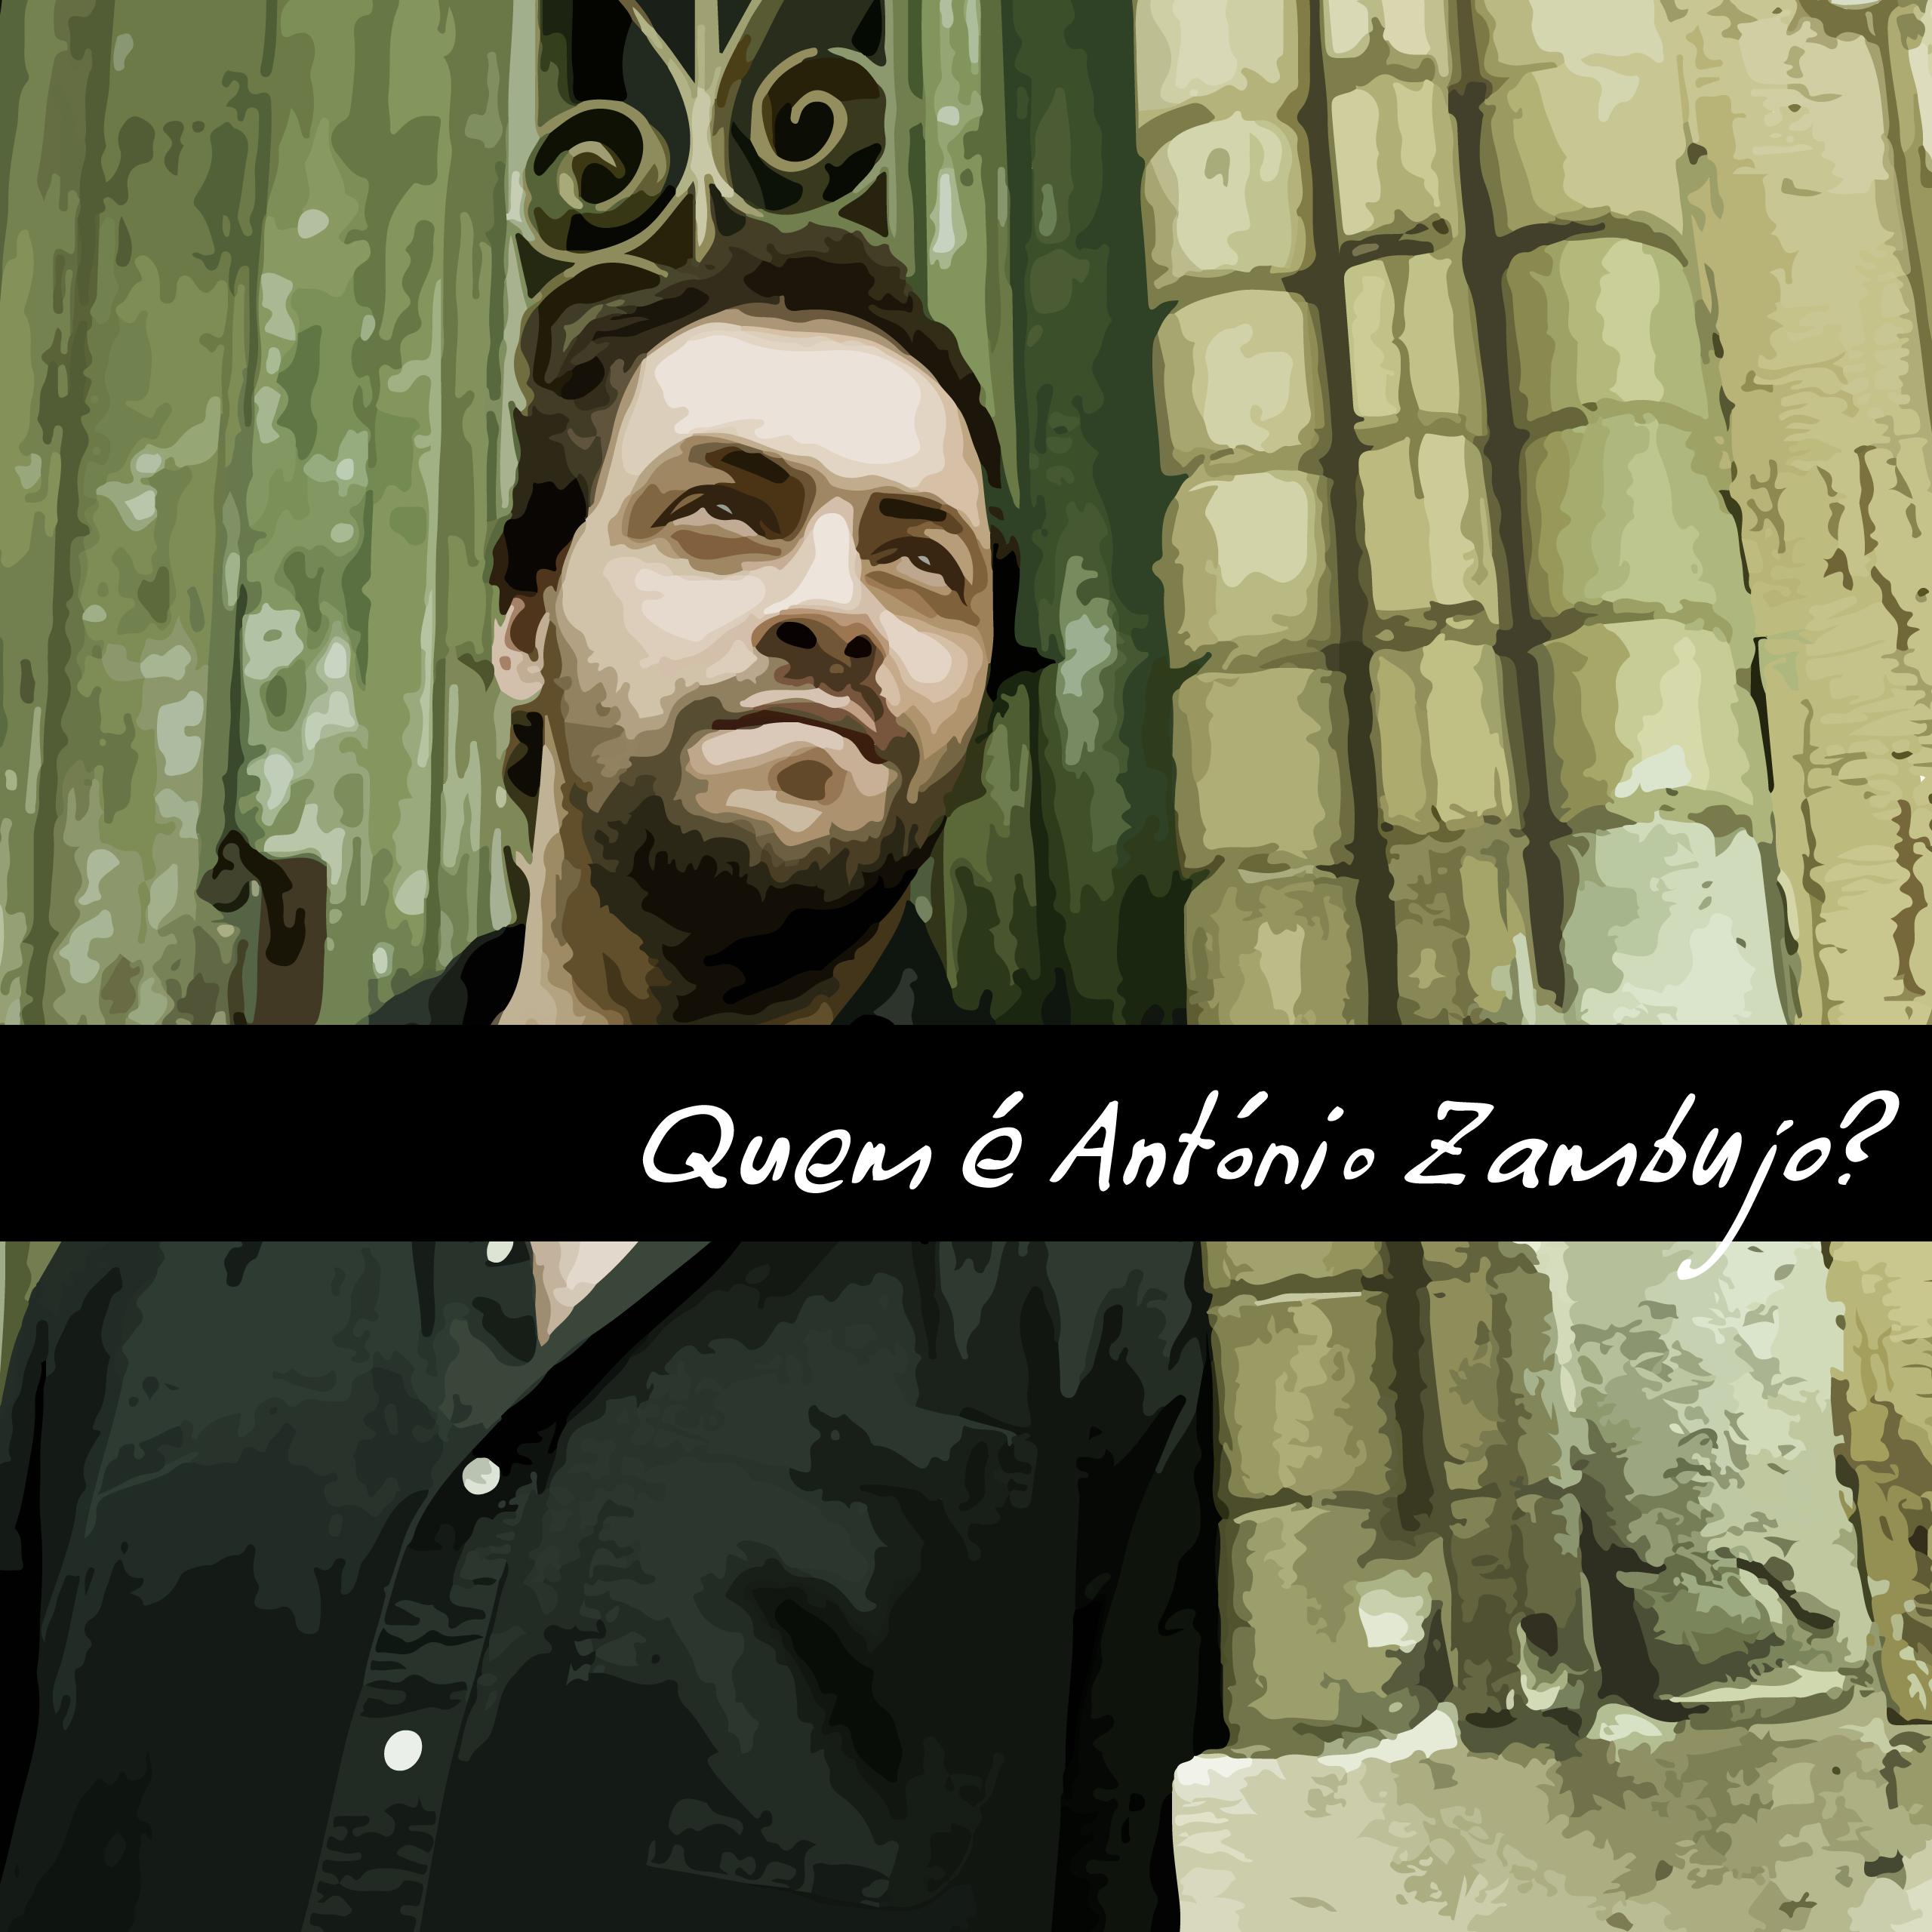 Quem-é-Antonio-Zambujo